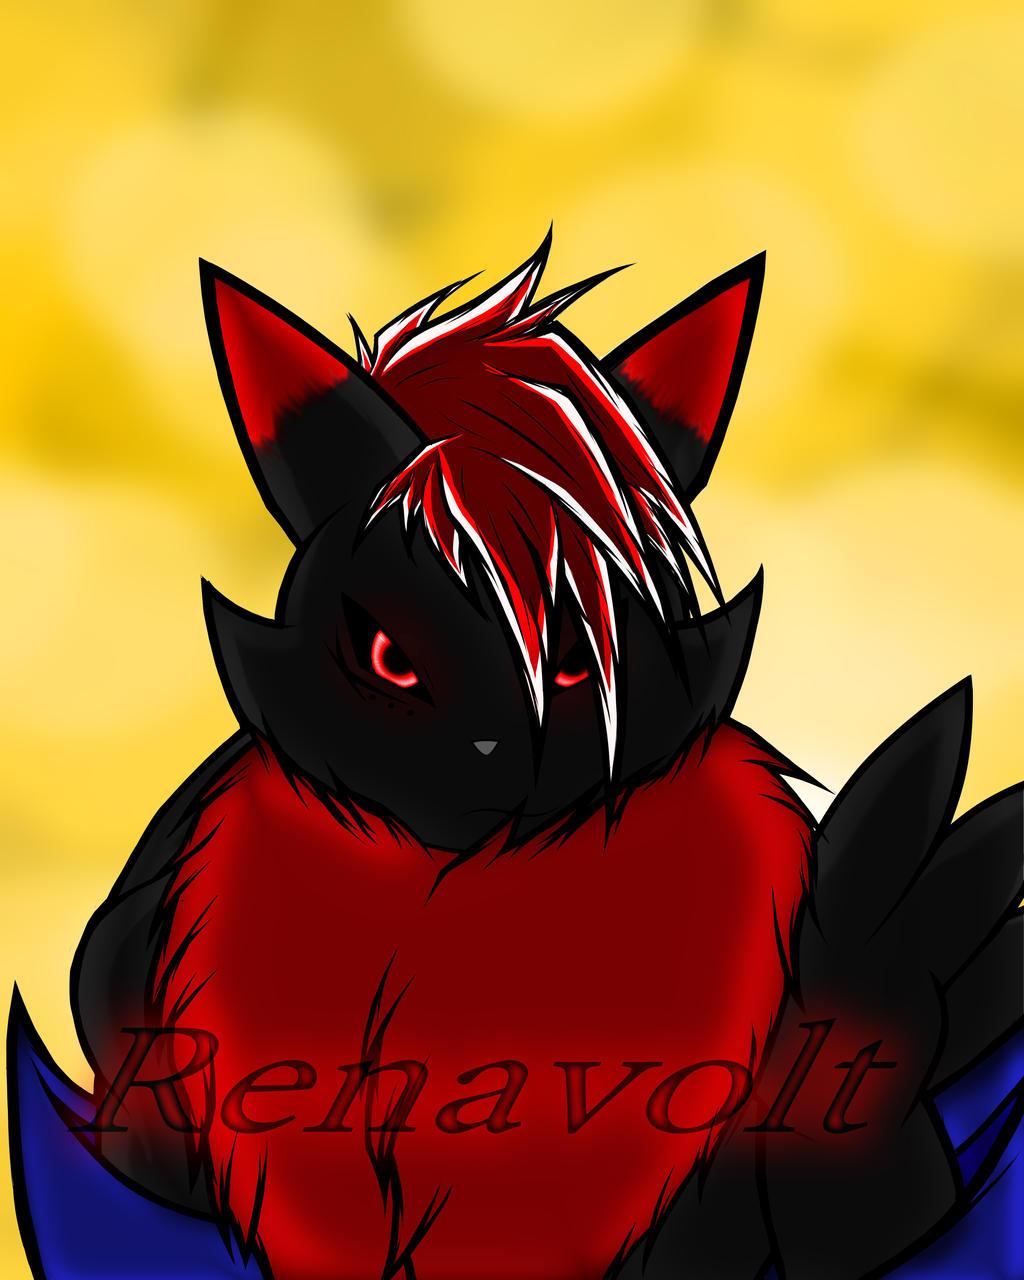 RevoltLarzWolfblade's Profile Picture